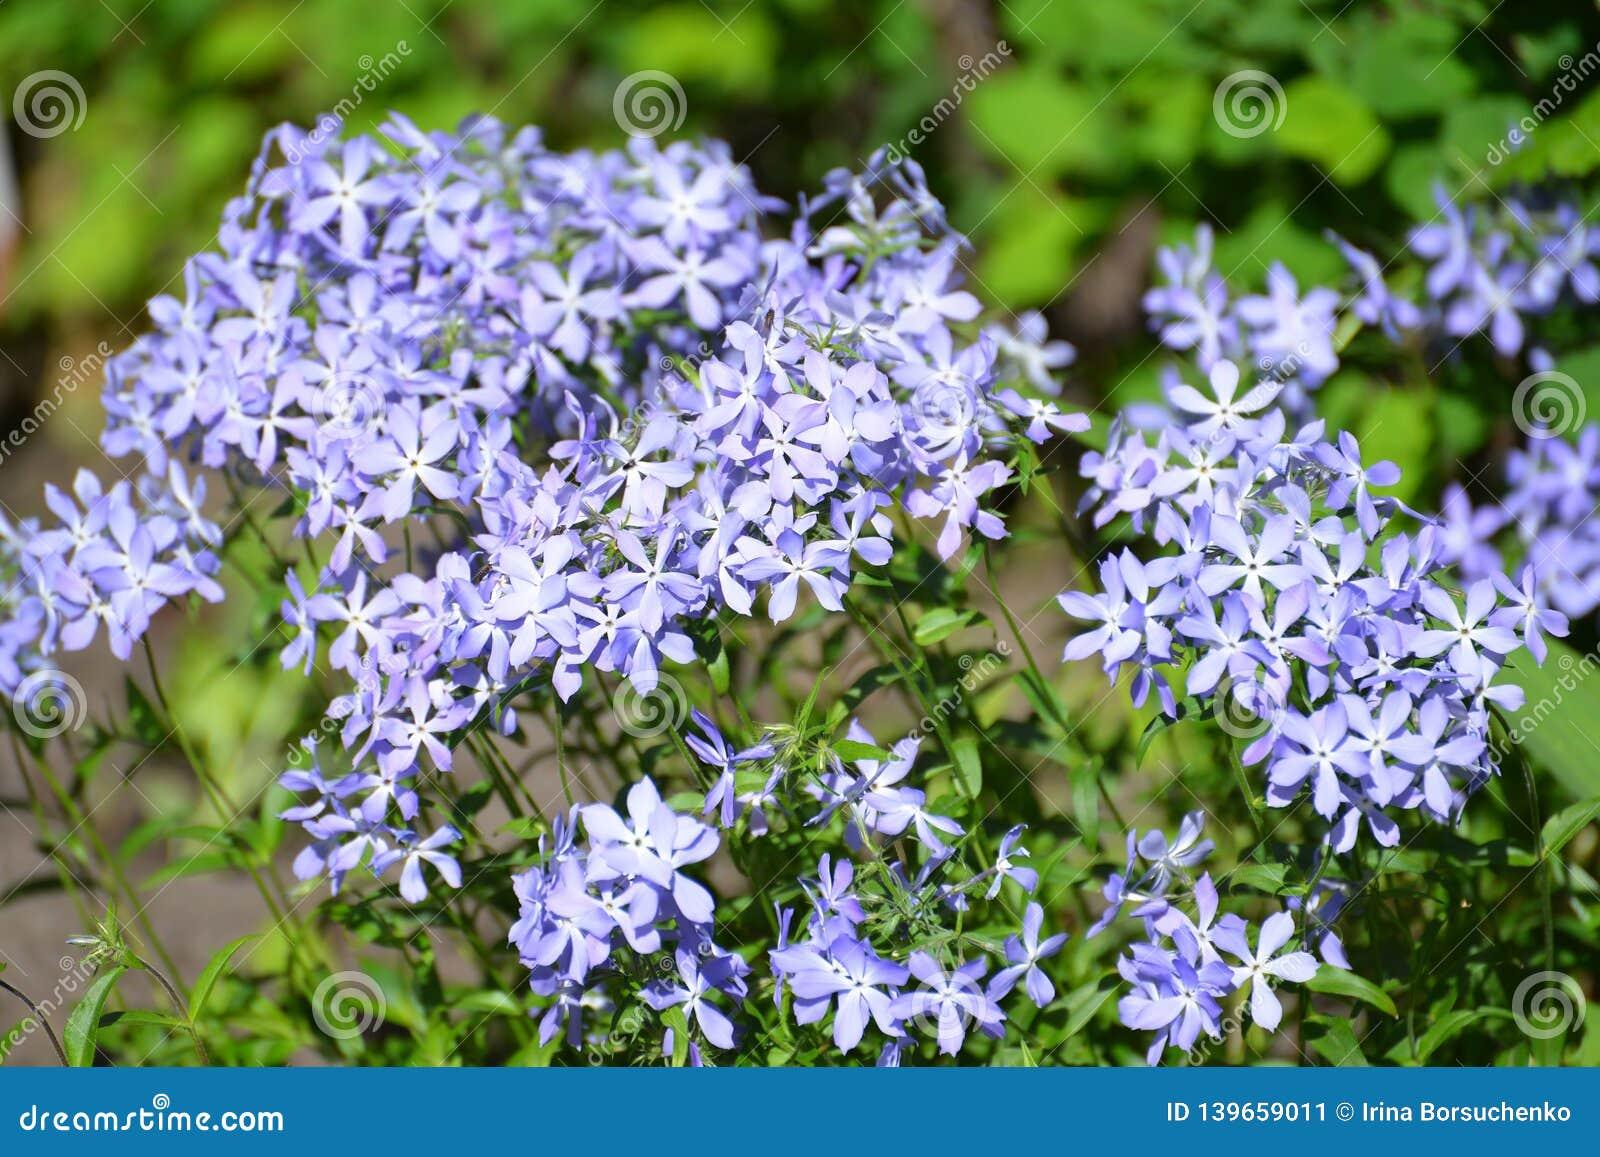 Flowers of the Sweet William phlox Phlox divaricata L